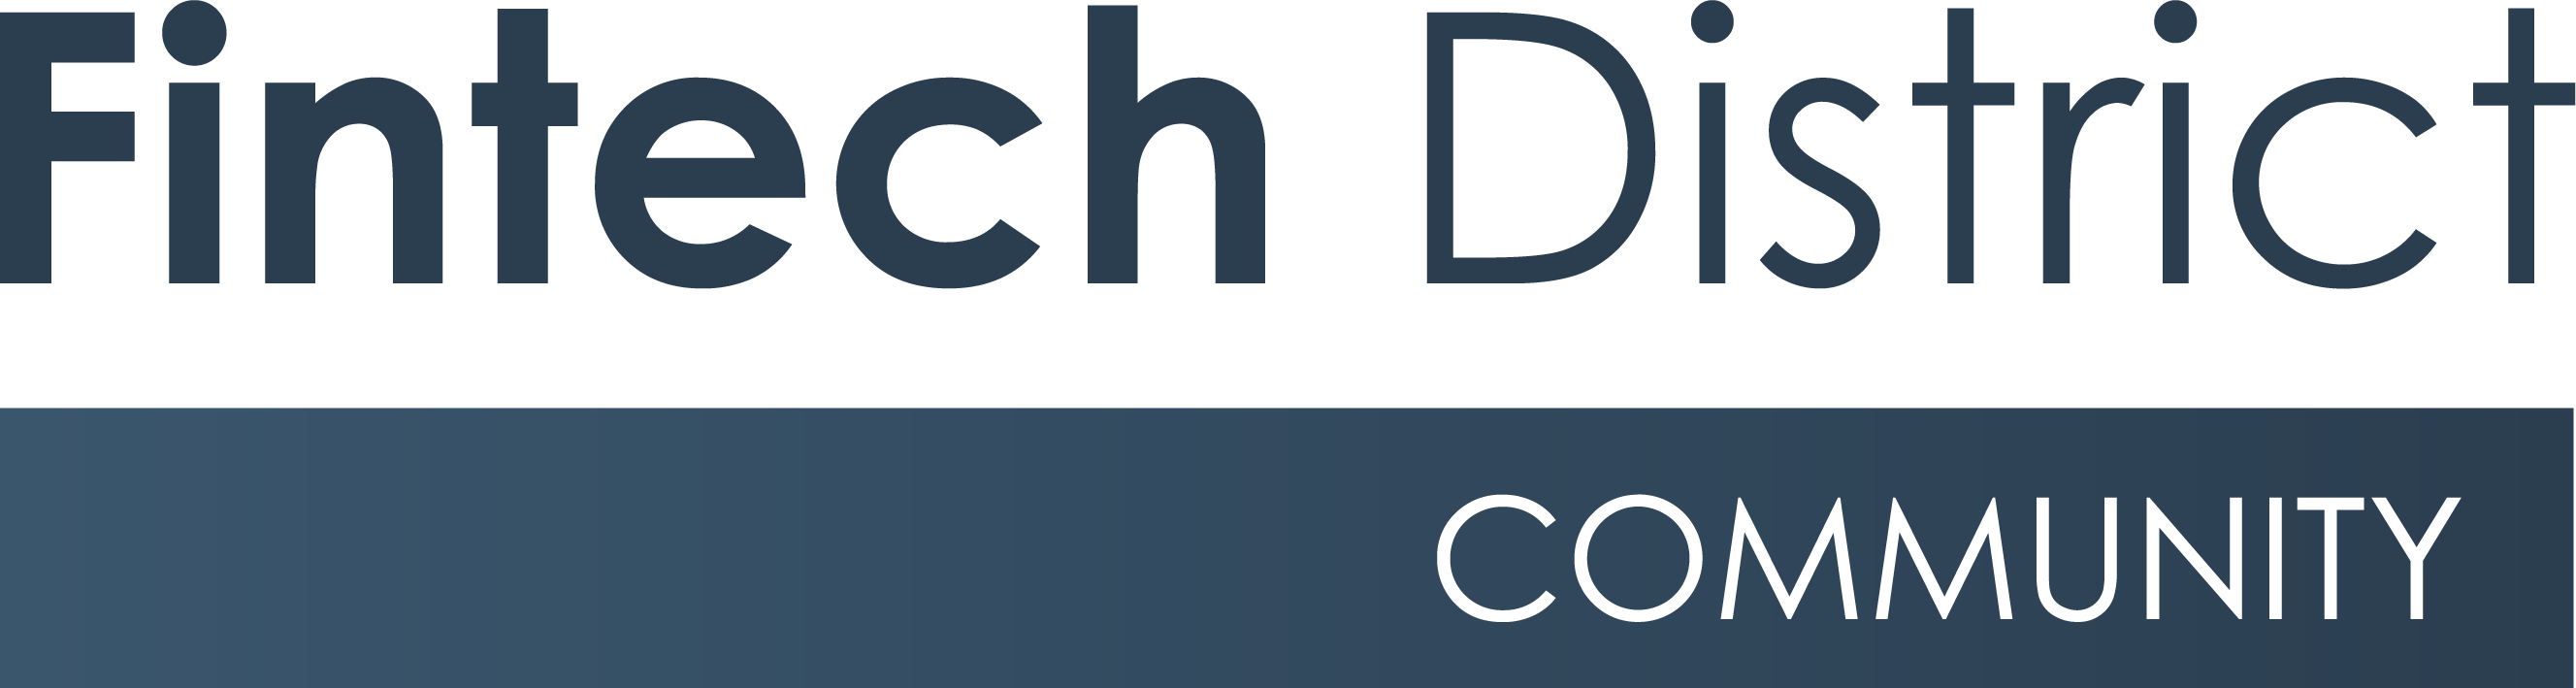 PINV - Fintech District Community